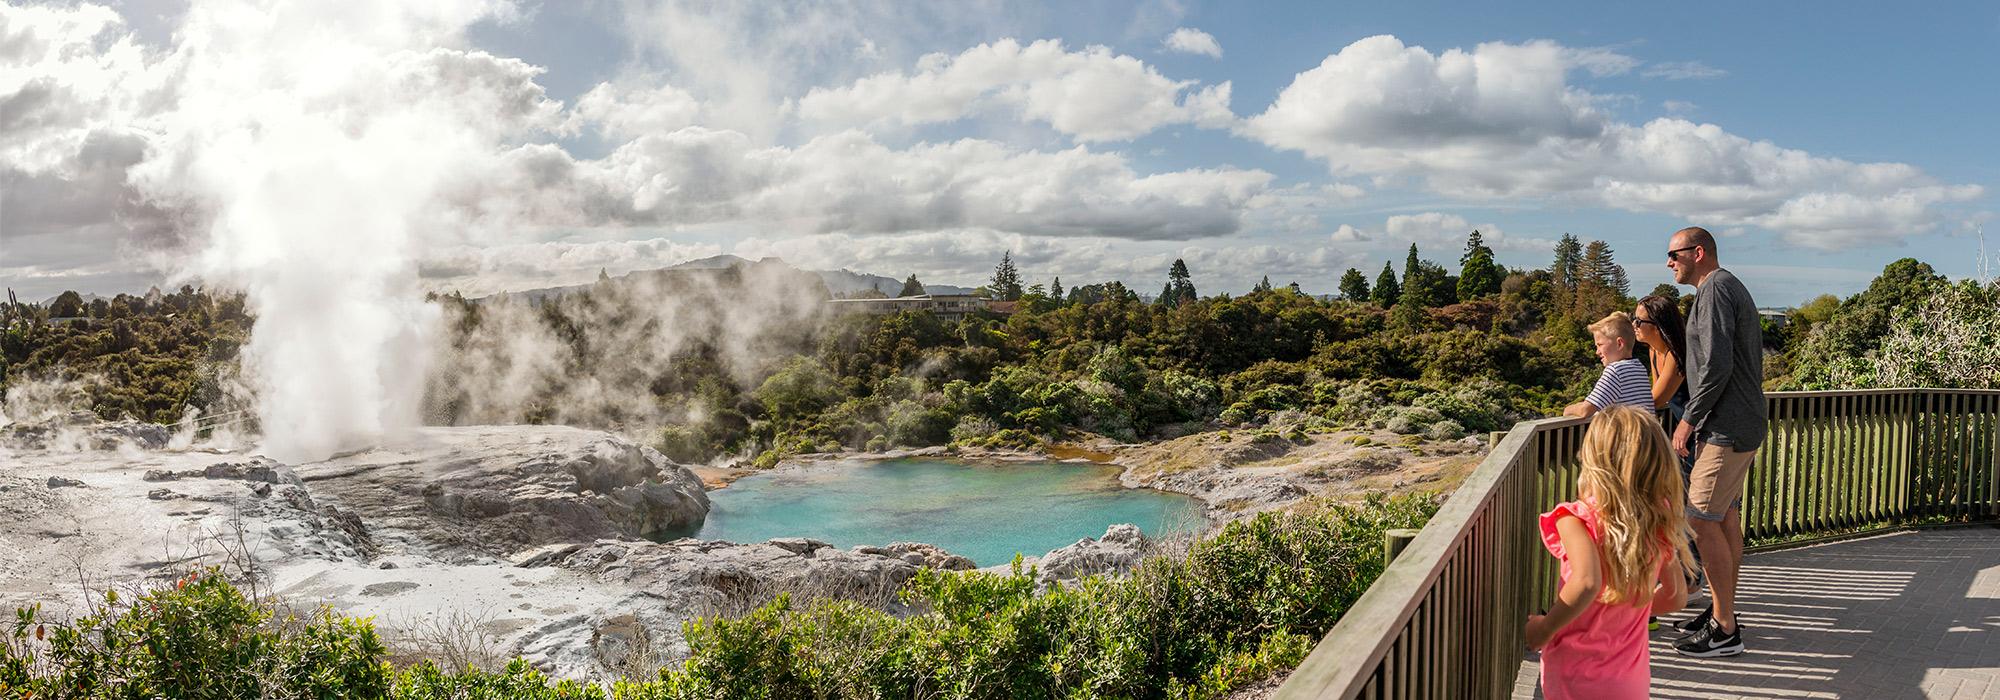 Rotorua is celebrated on screen as Cousins hits Kiwi cinemas